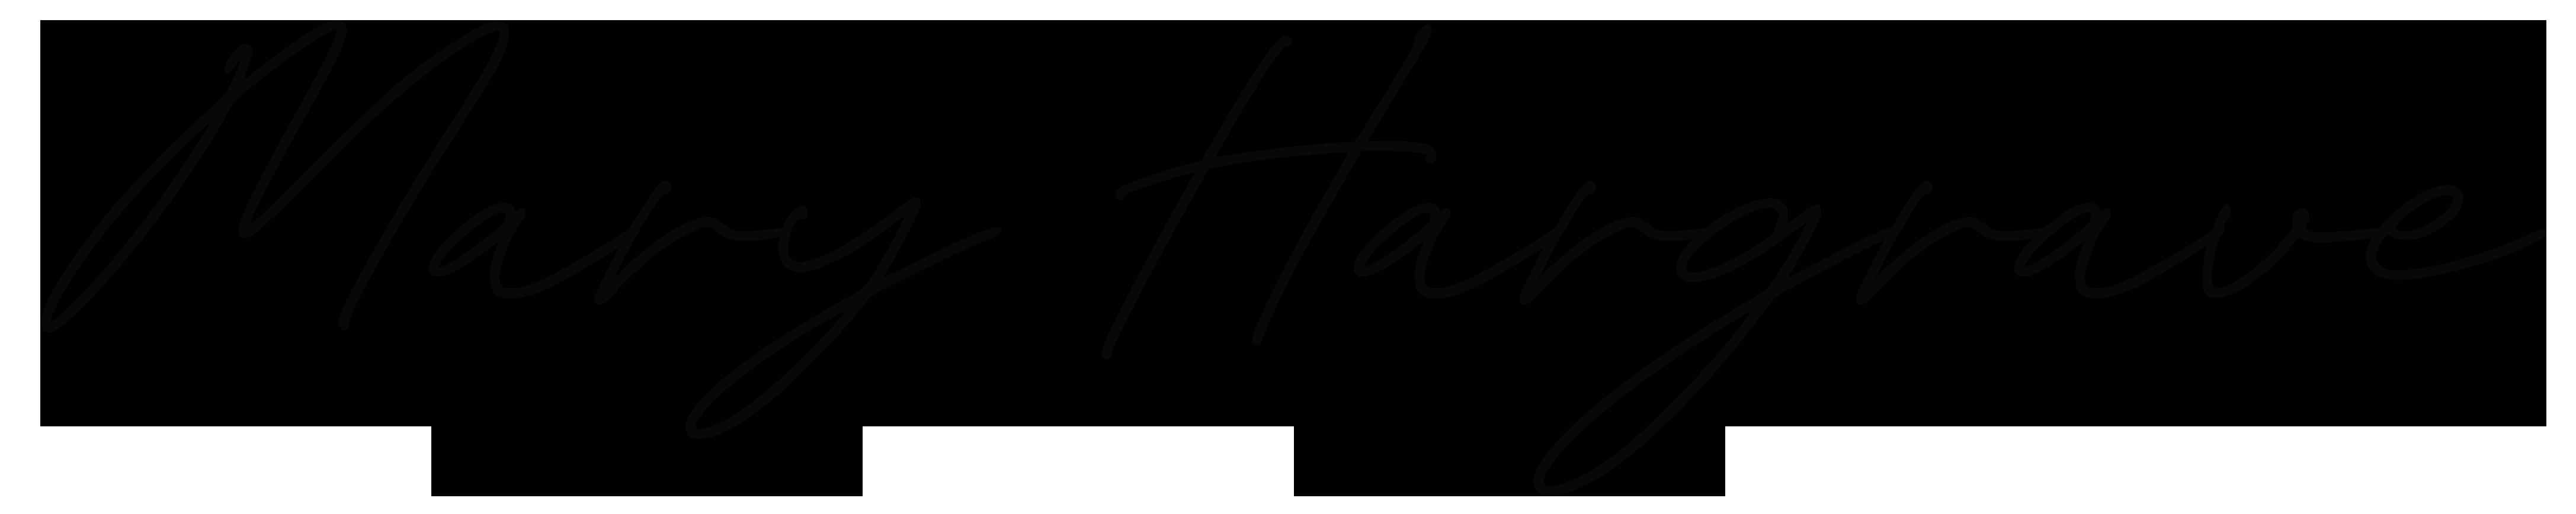 Mary Hargrave signature